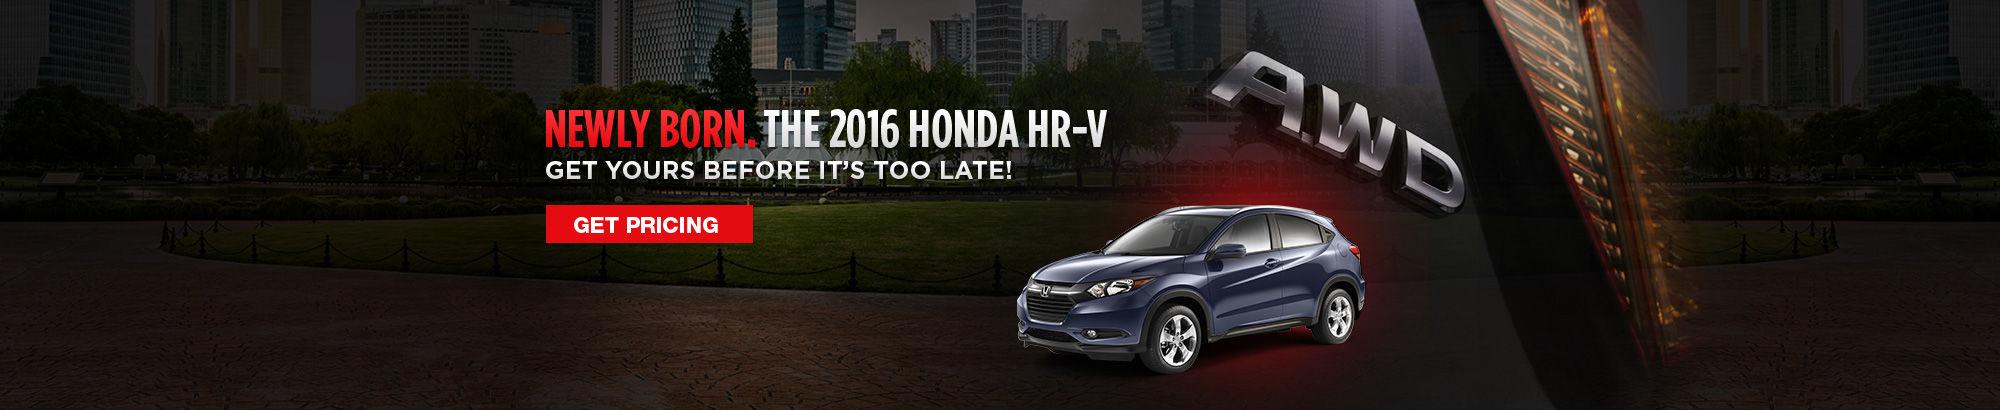 The 2016 Honda HR-V